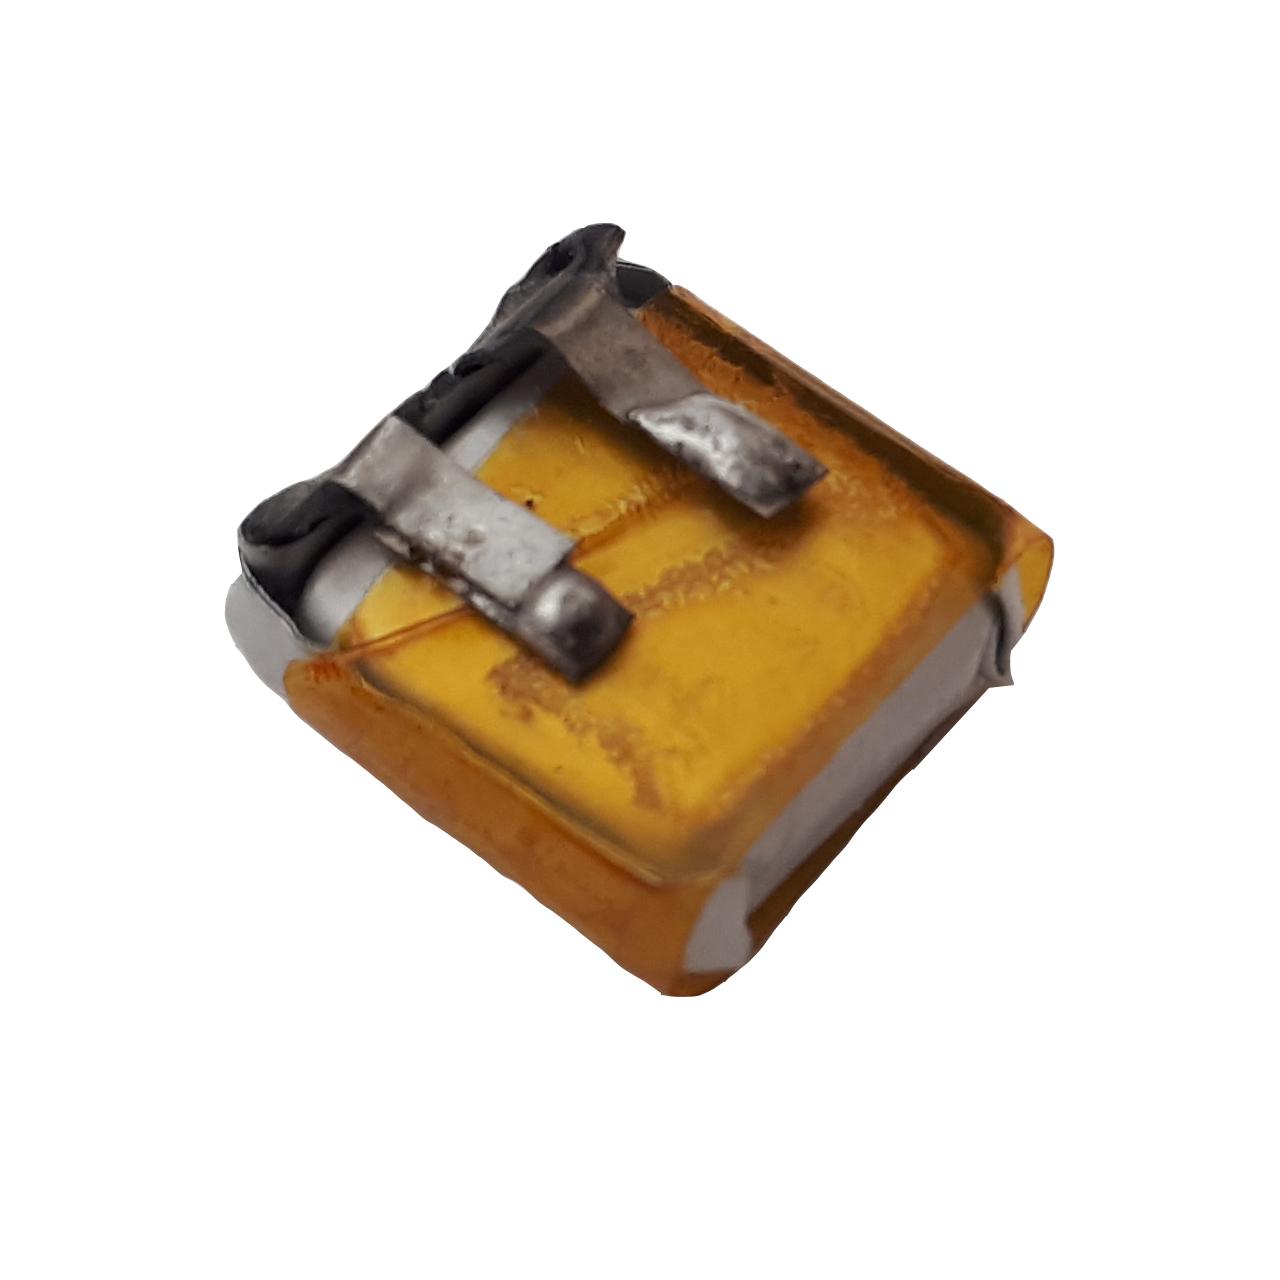 باتری لیتیوم-یون قابل شارژ کد ICR-6671 ظرفیت 90 میلی آمپرساعت مناسب برای اپل ایرپاد